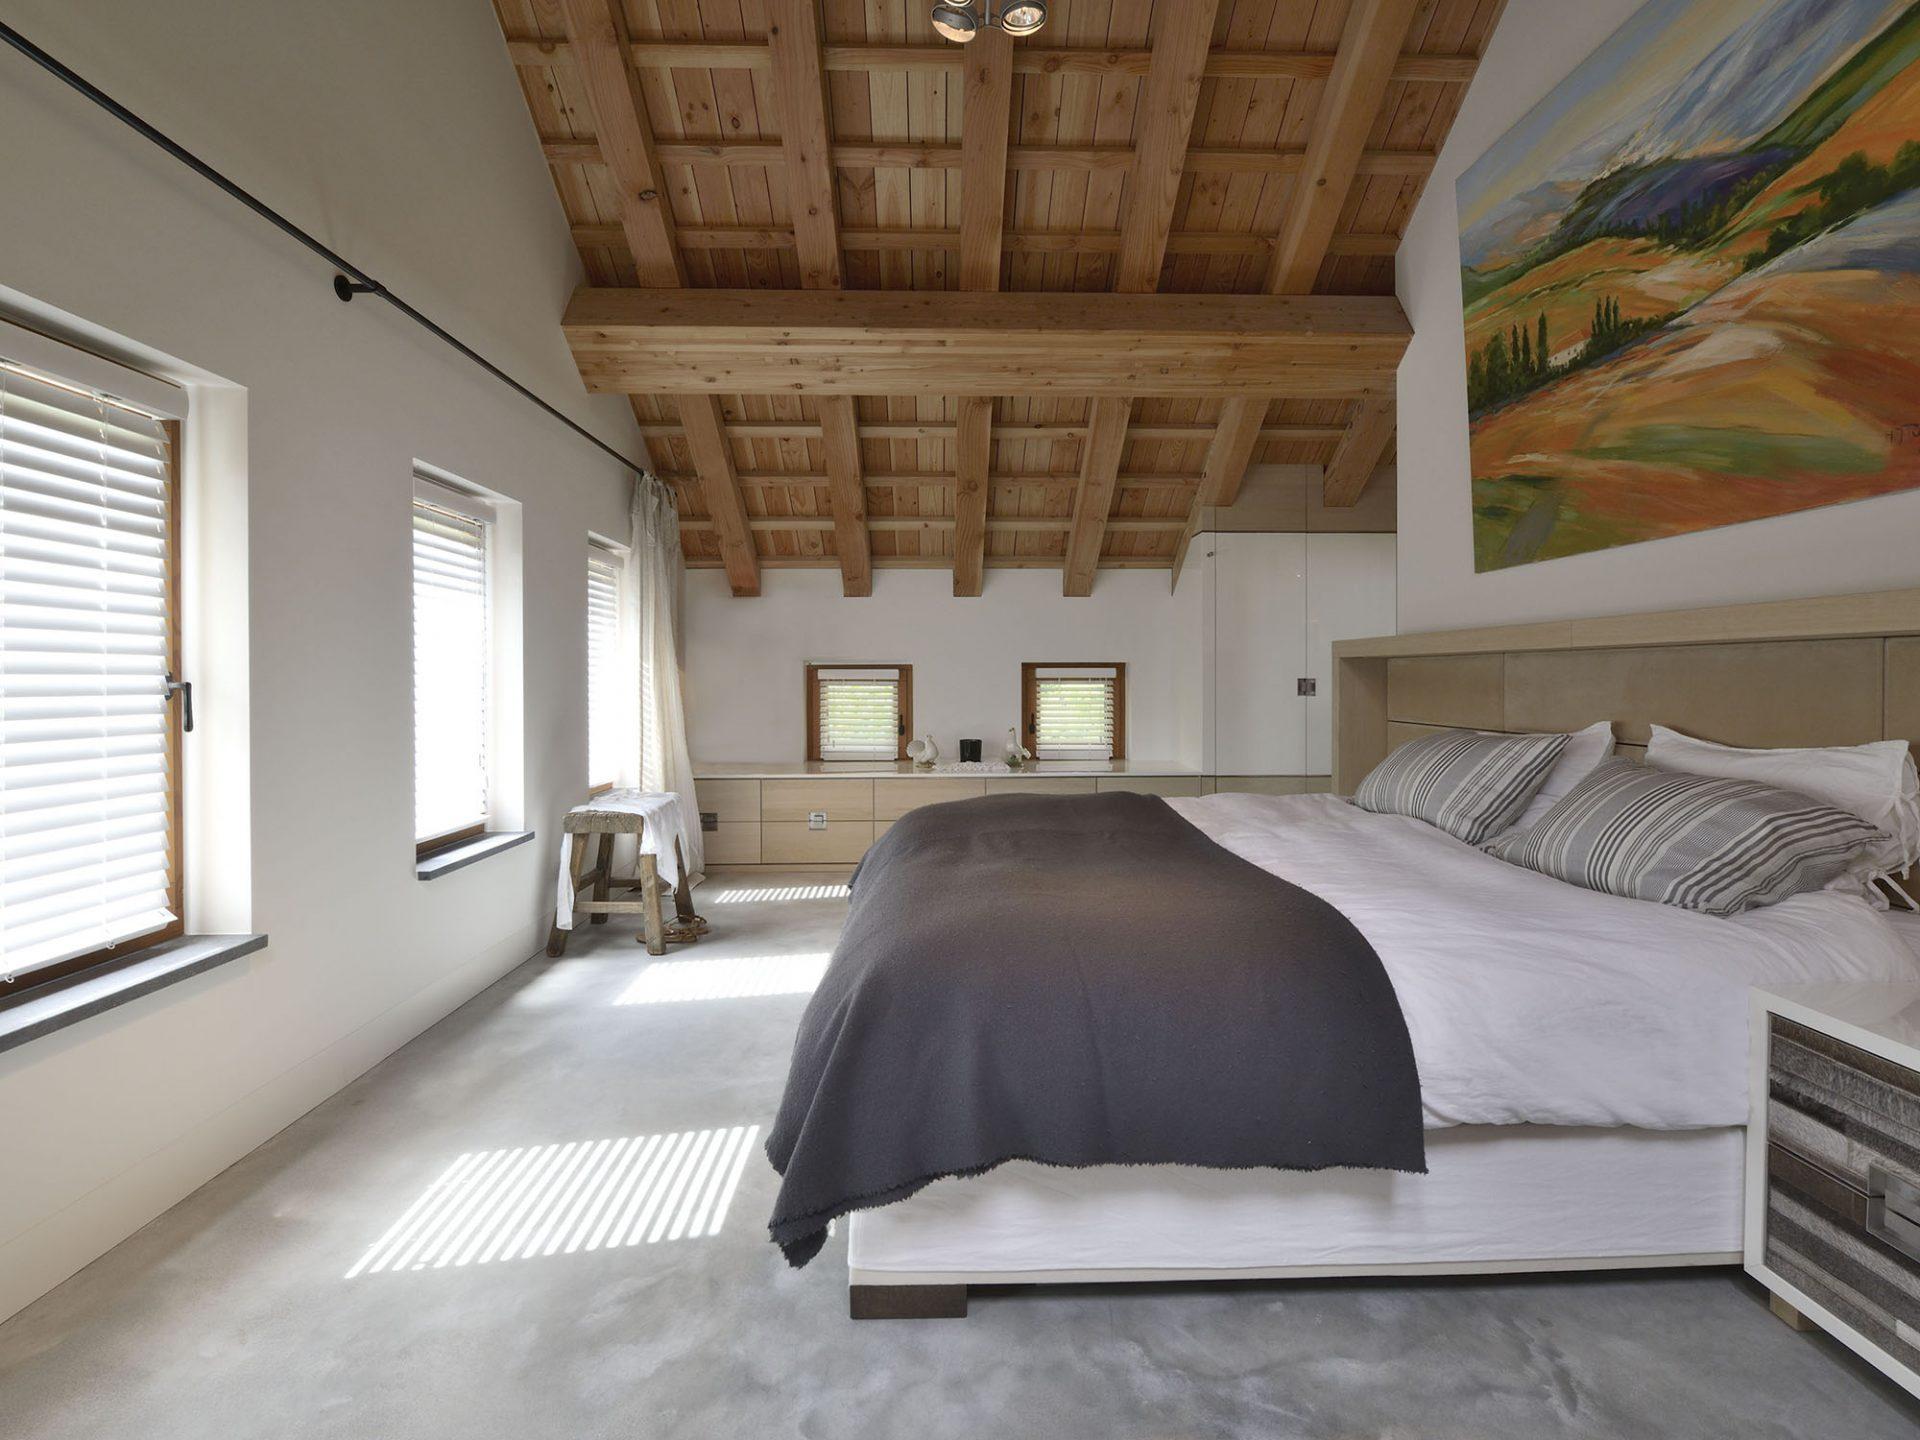 Slaapkamer Inrichten Design : Slaapkamer inrichting modern residential living emyko